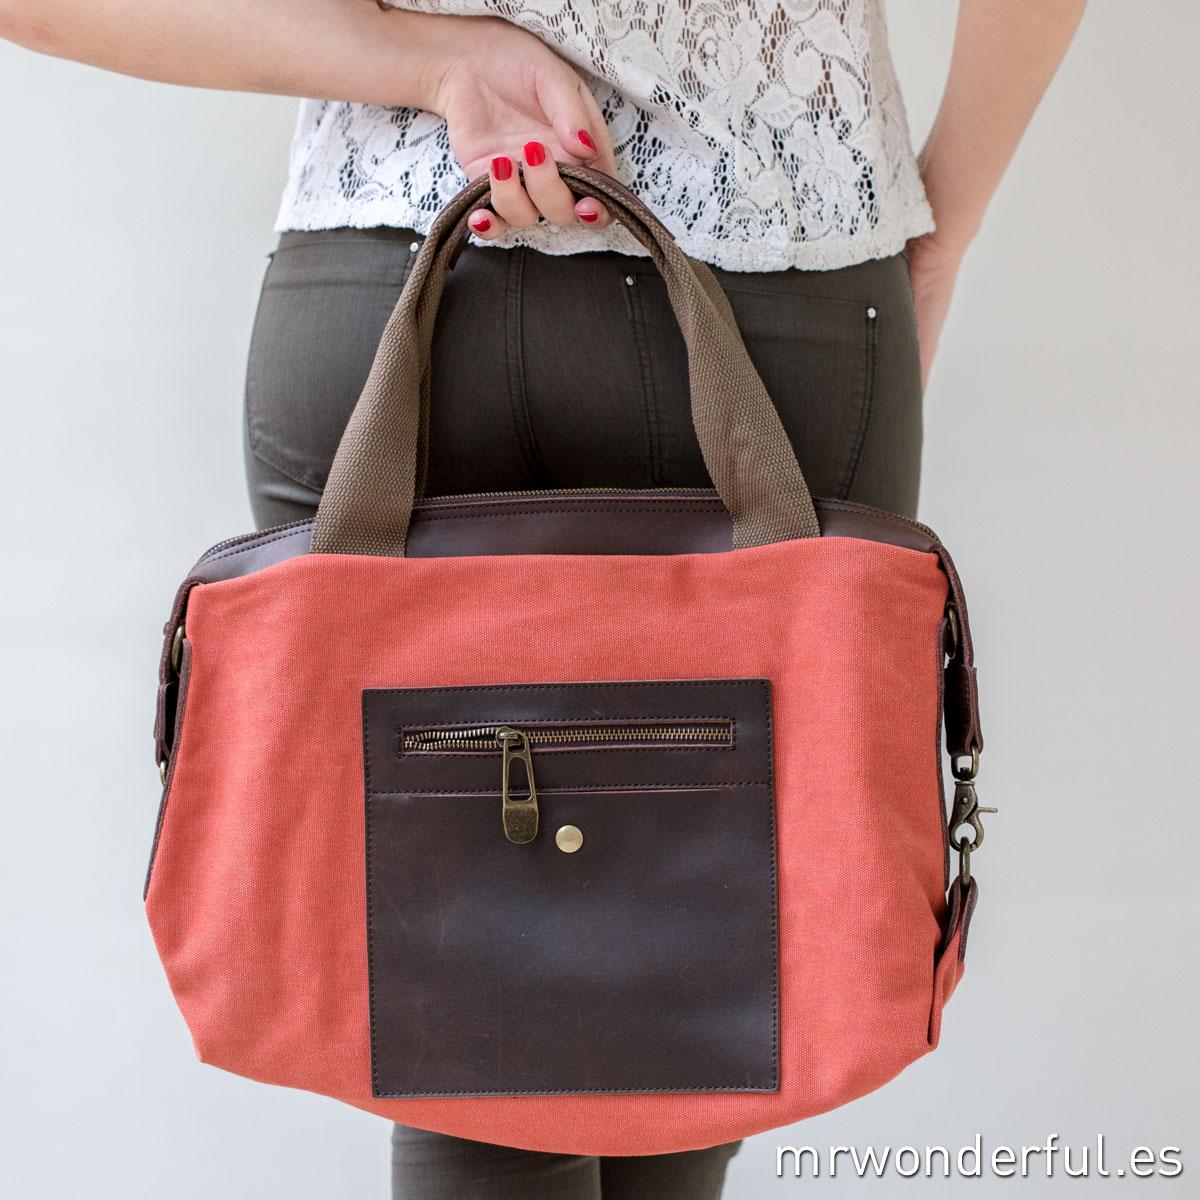 mrwonderful_bags_W2096-Corail-22